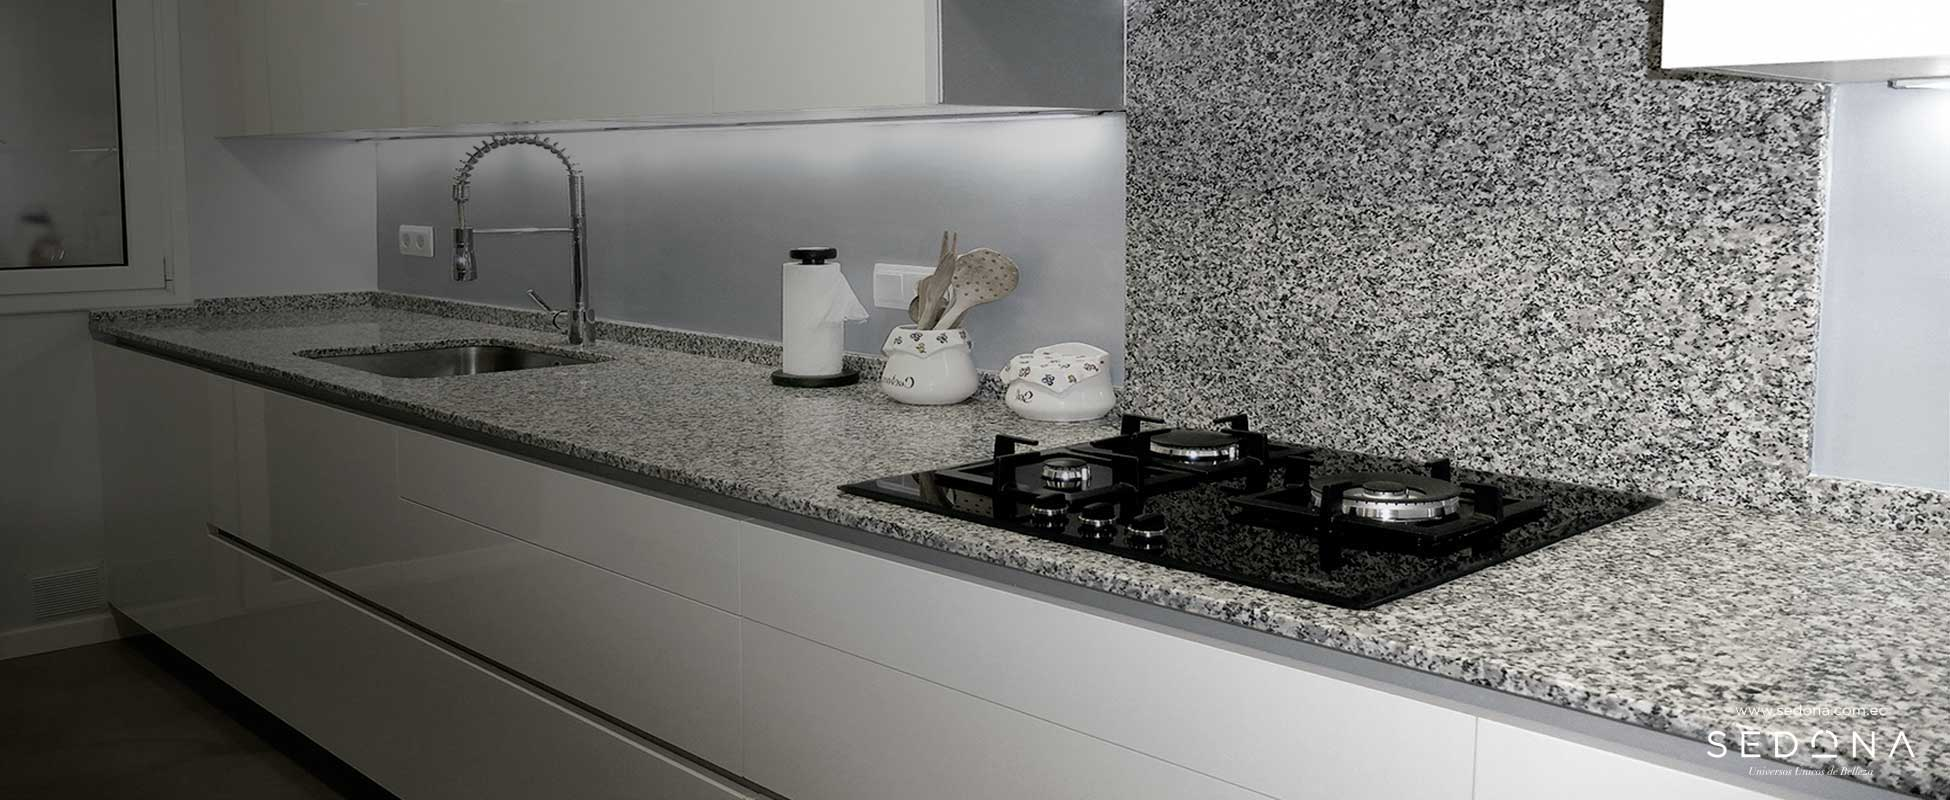 Granito blanco cristal sedona importador directo for Granito blanco para cocina